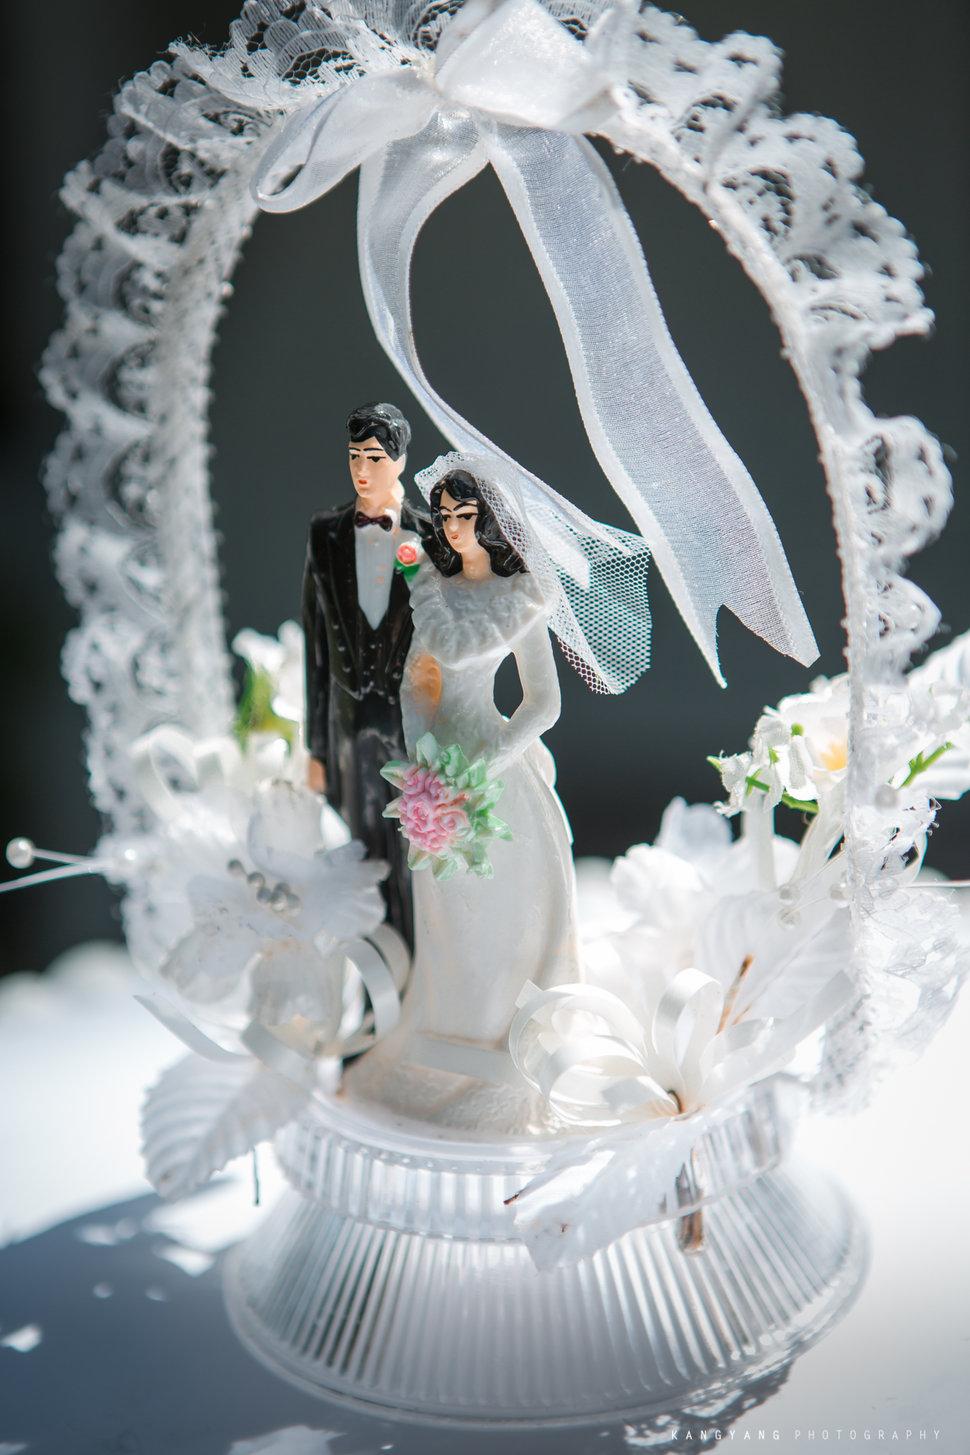 U&M 戶外證婚教堂婚禮@台北青青食尚花園/費加洛教堂(編號:307054) - 婚攝楊康影像Kstudio《結婚吧》